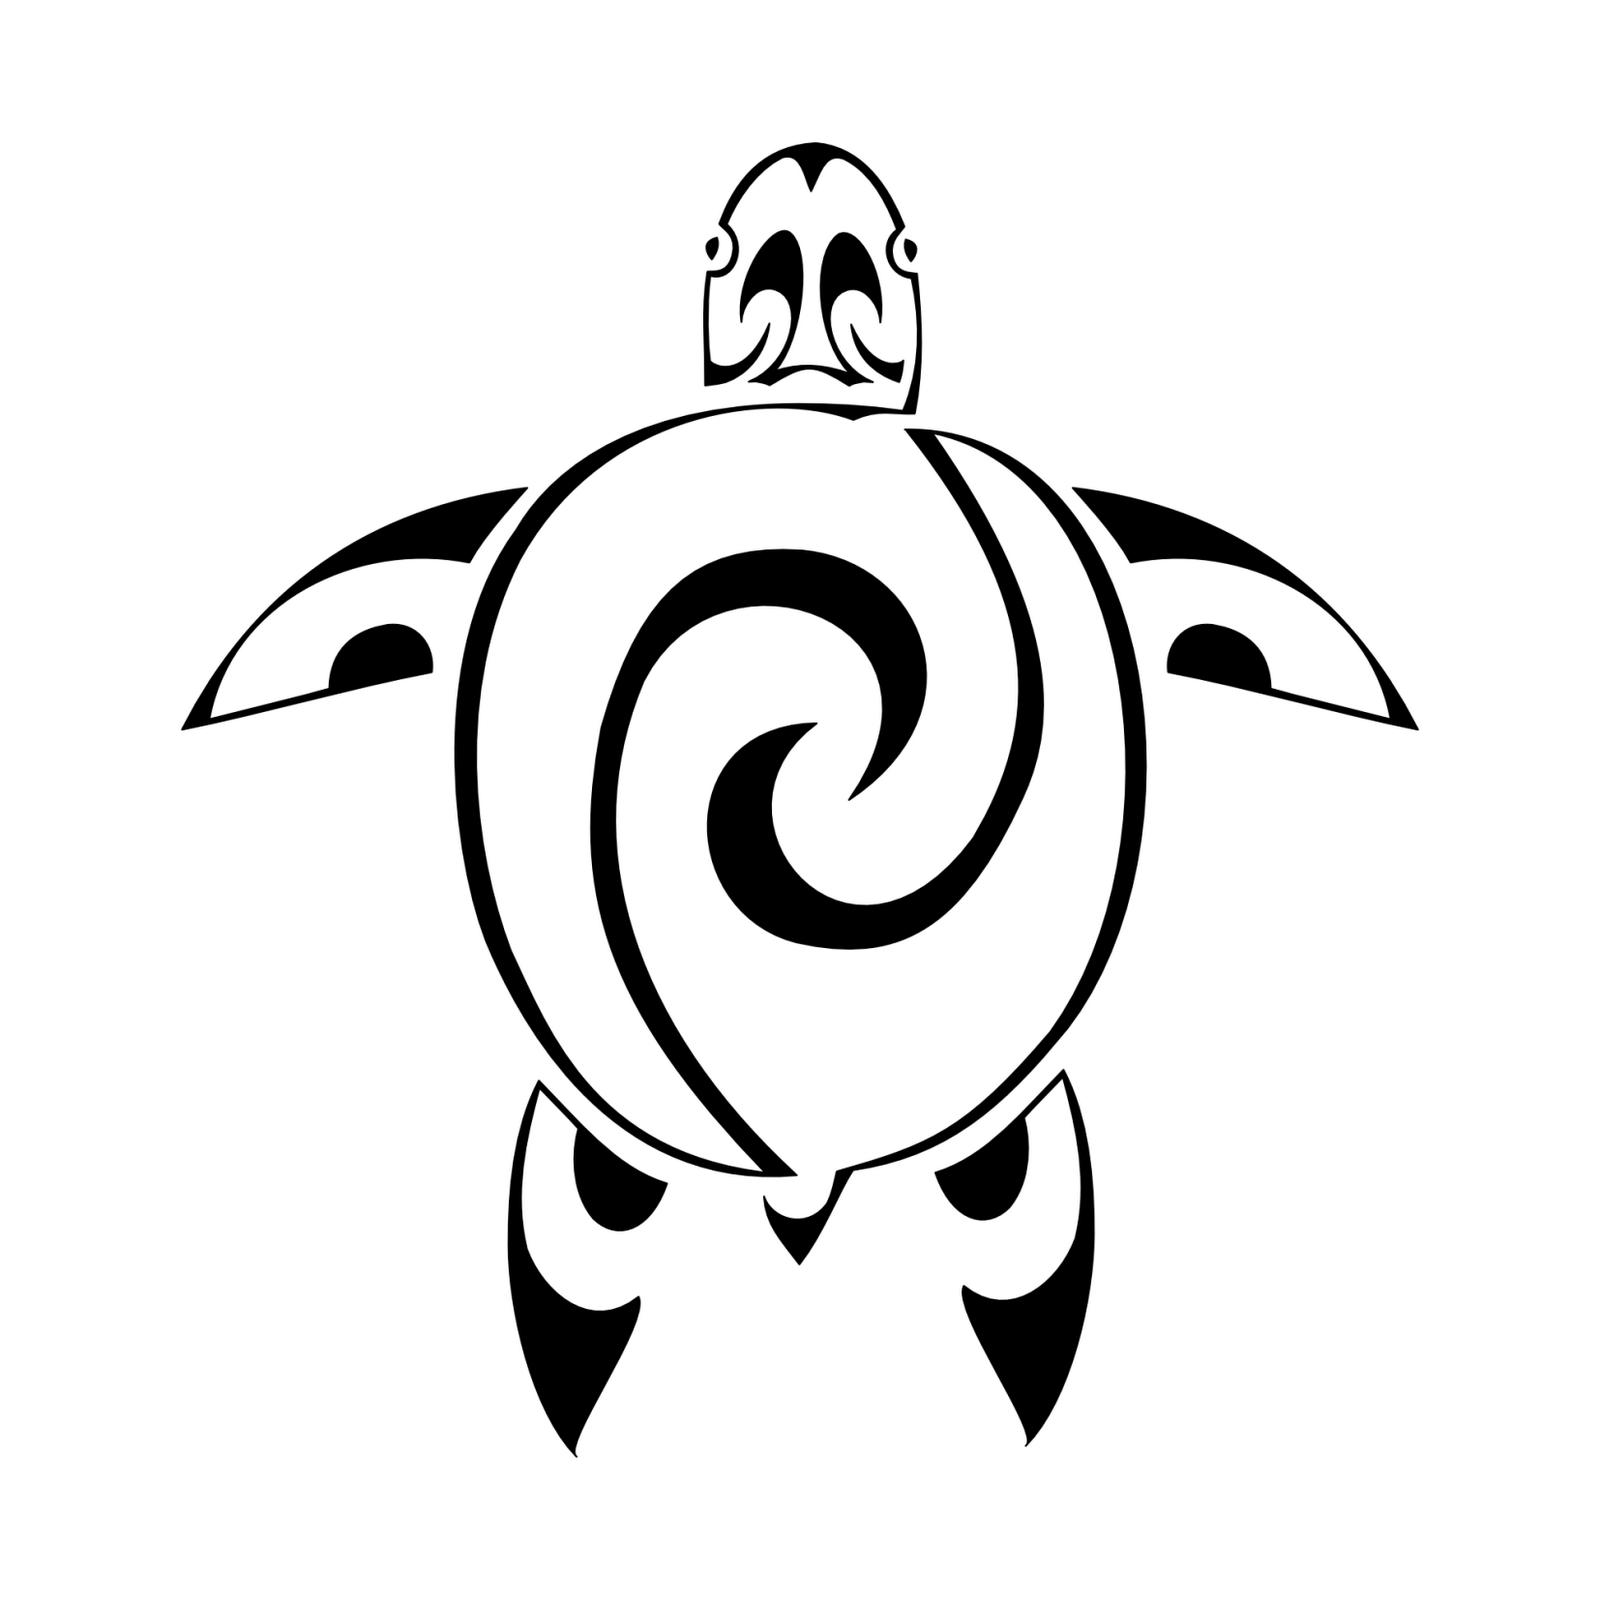 turtle art maori turtle tattoo royalty free stock vector. Black Bedroom Furniture Sets. Home Design Ideas